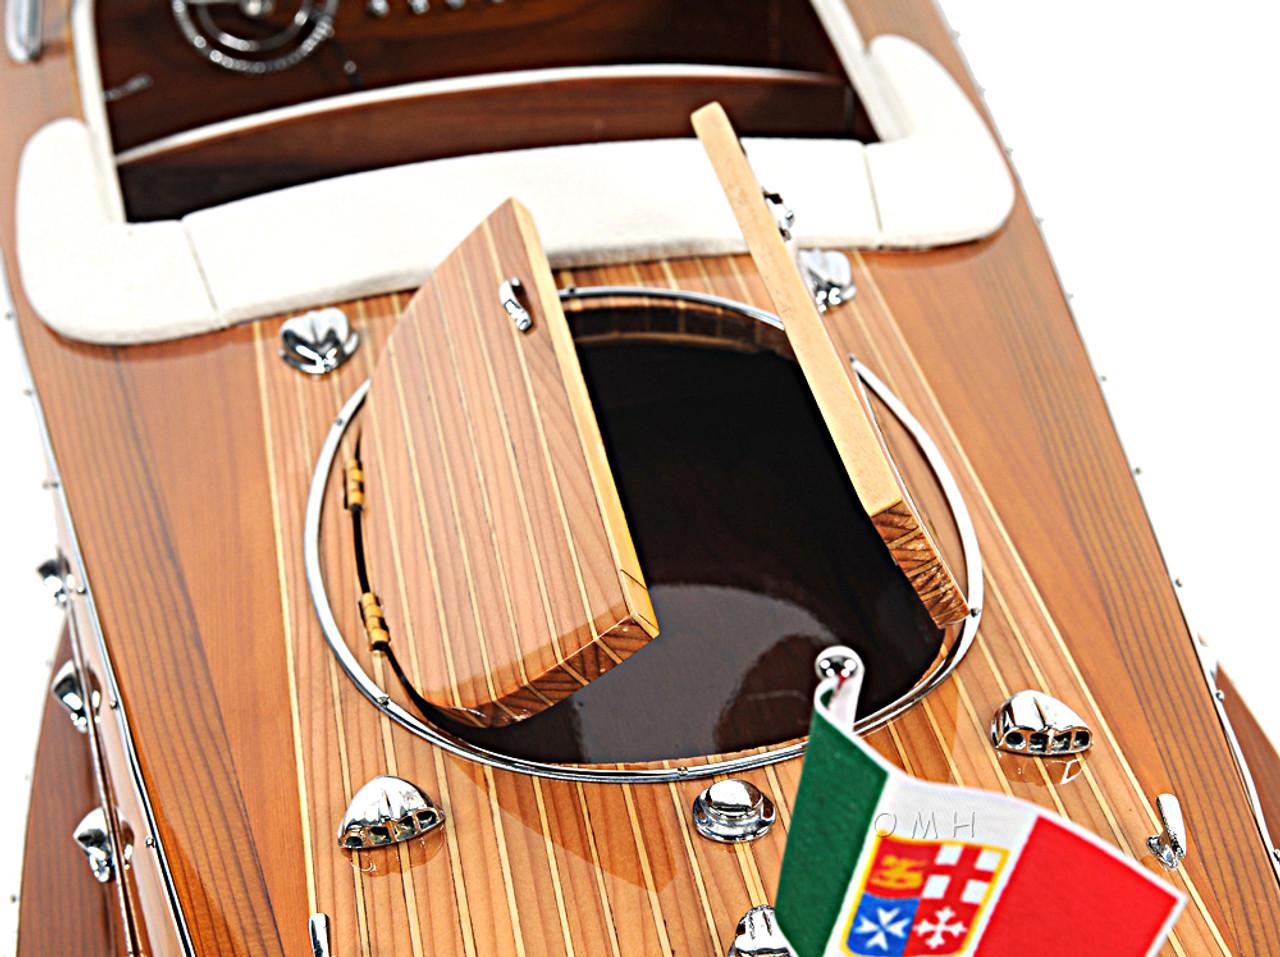 Riva Ariston Speed Boat Scale Model Runabout